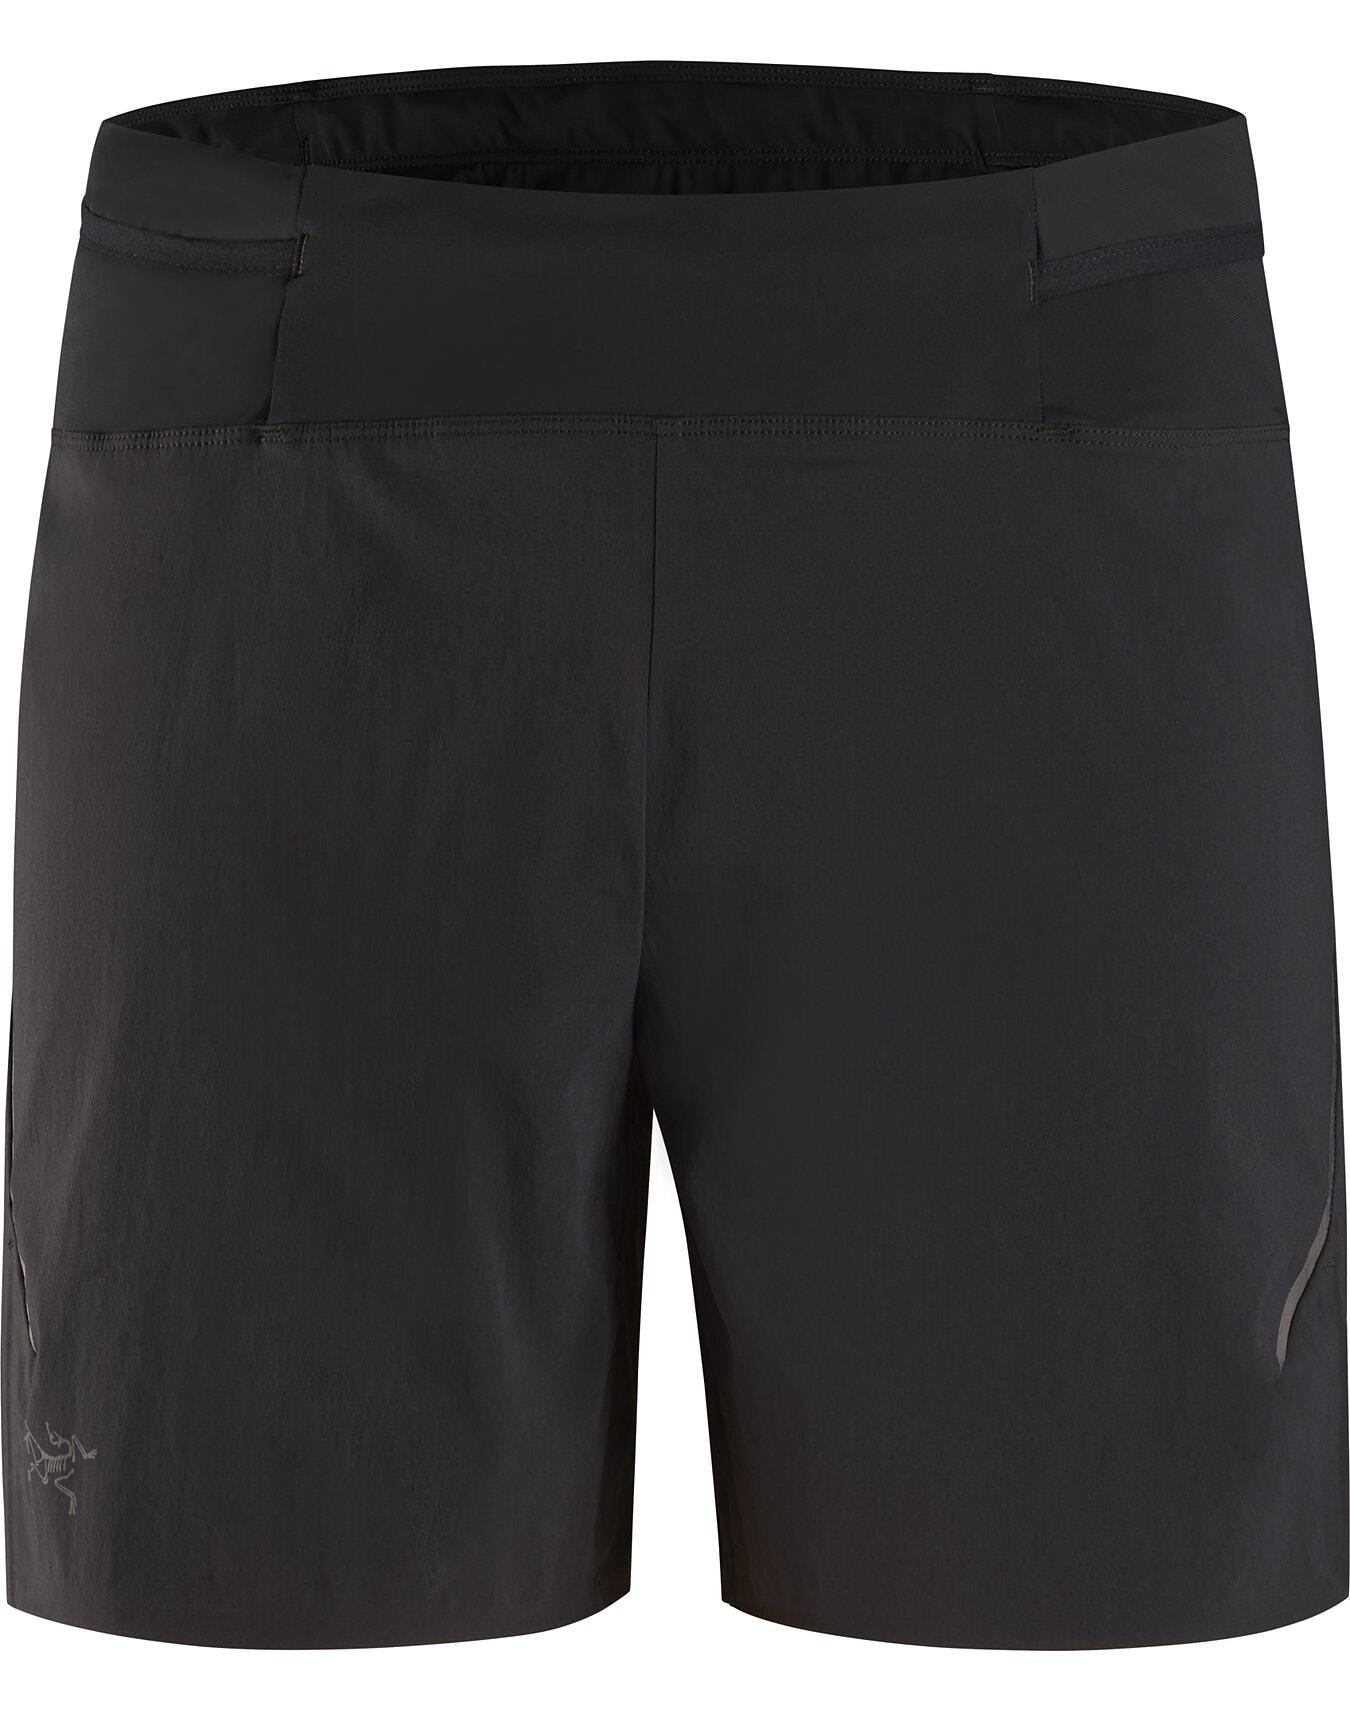 Motus Short 6 Black